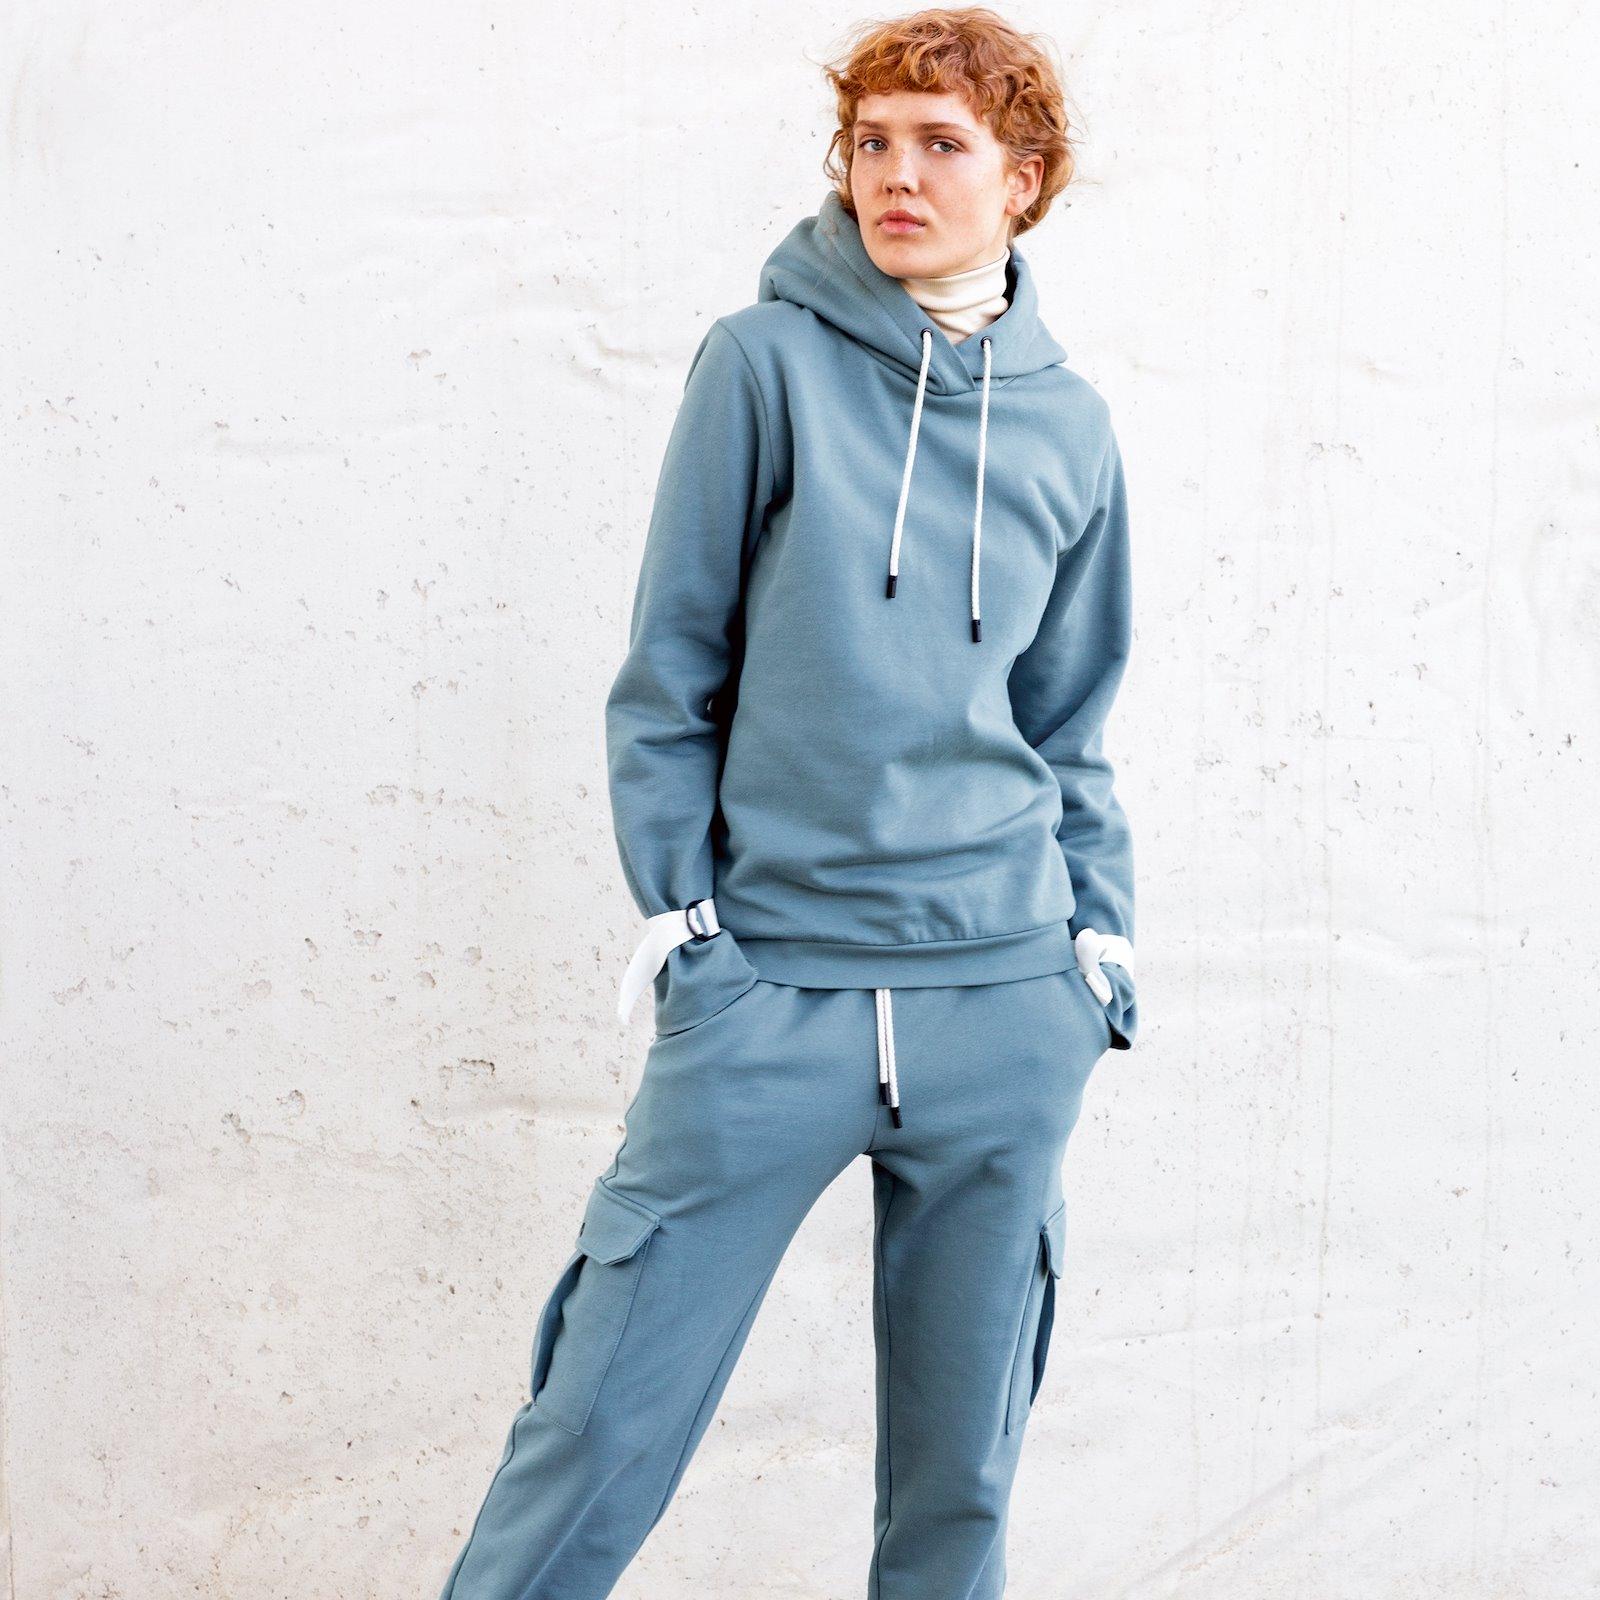 Organic french terry antiqu blue brushed p22073_211748_272414_230619_43693_75202_43702_80082_45538_p20054_45052_bundle